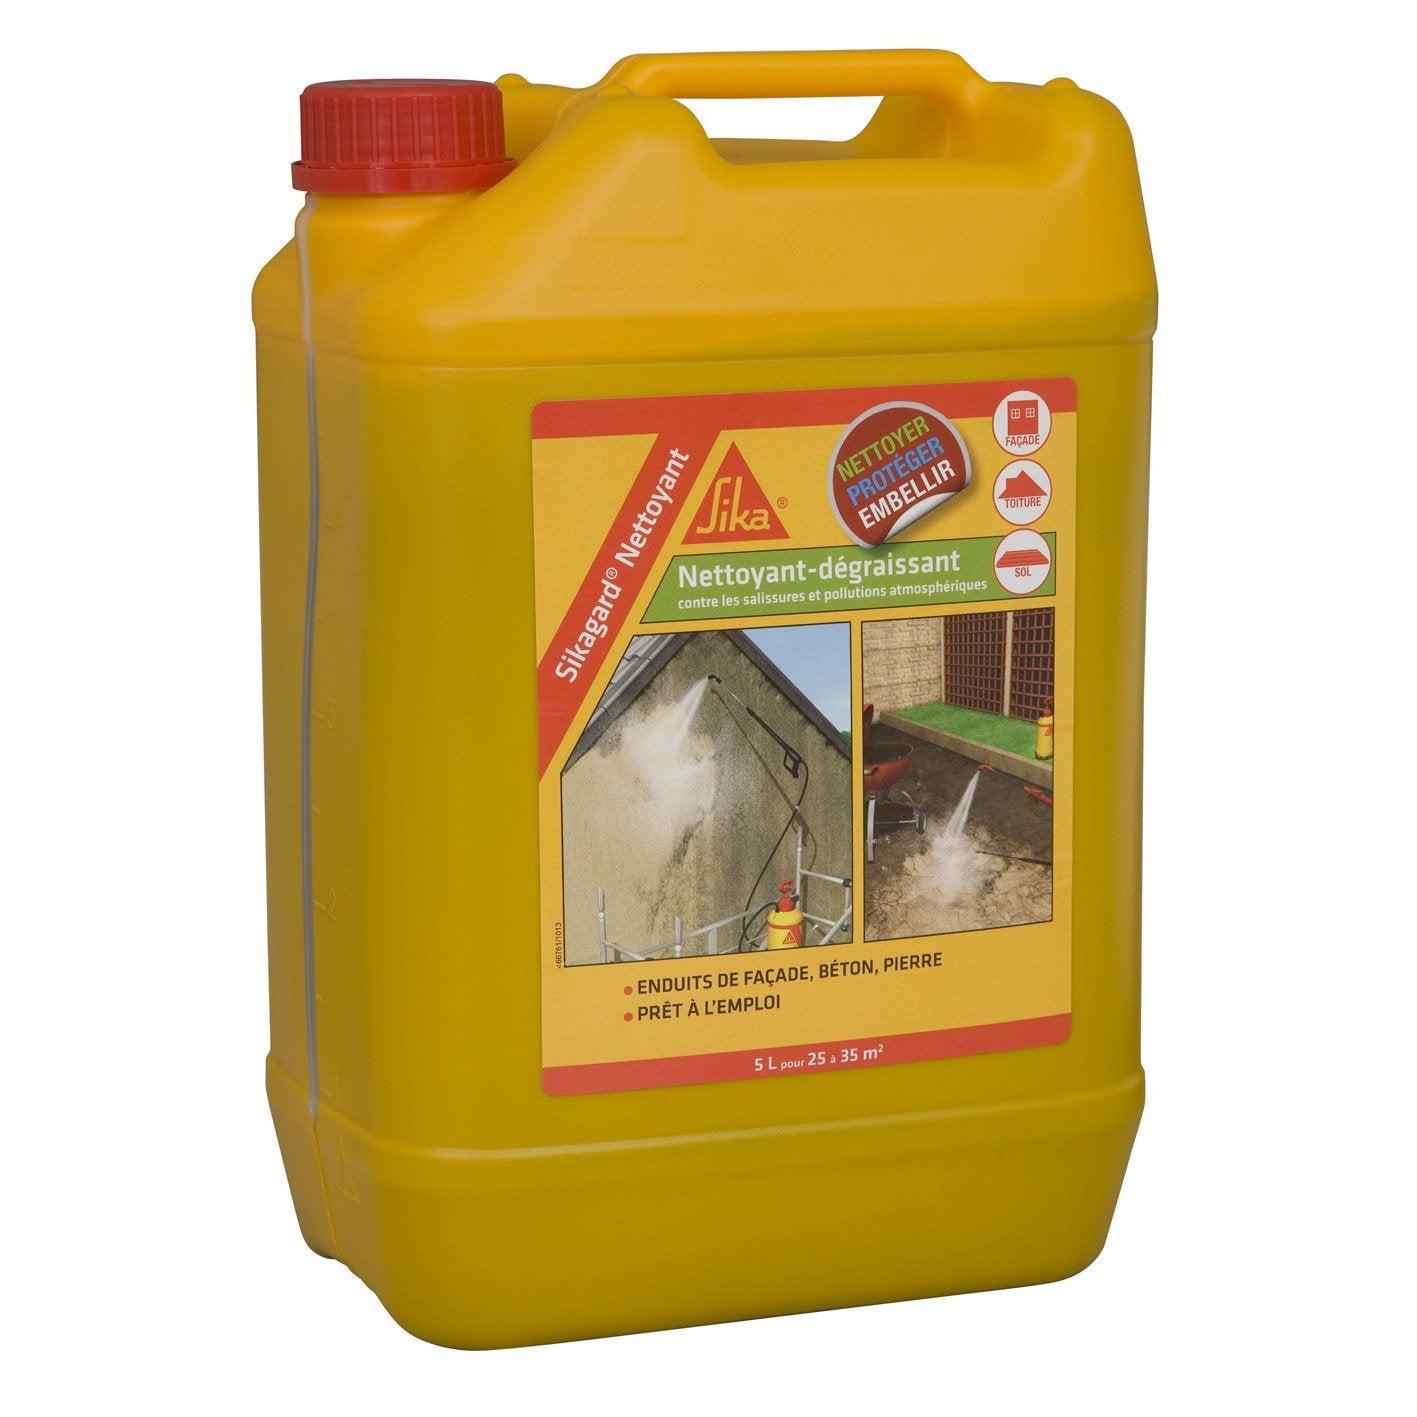 Nettoyant Desincrustant Sika Sikagard 5 L Incolore Nettoyant Degraissant Nettoyage Facade